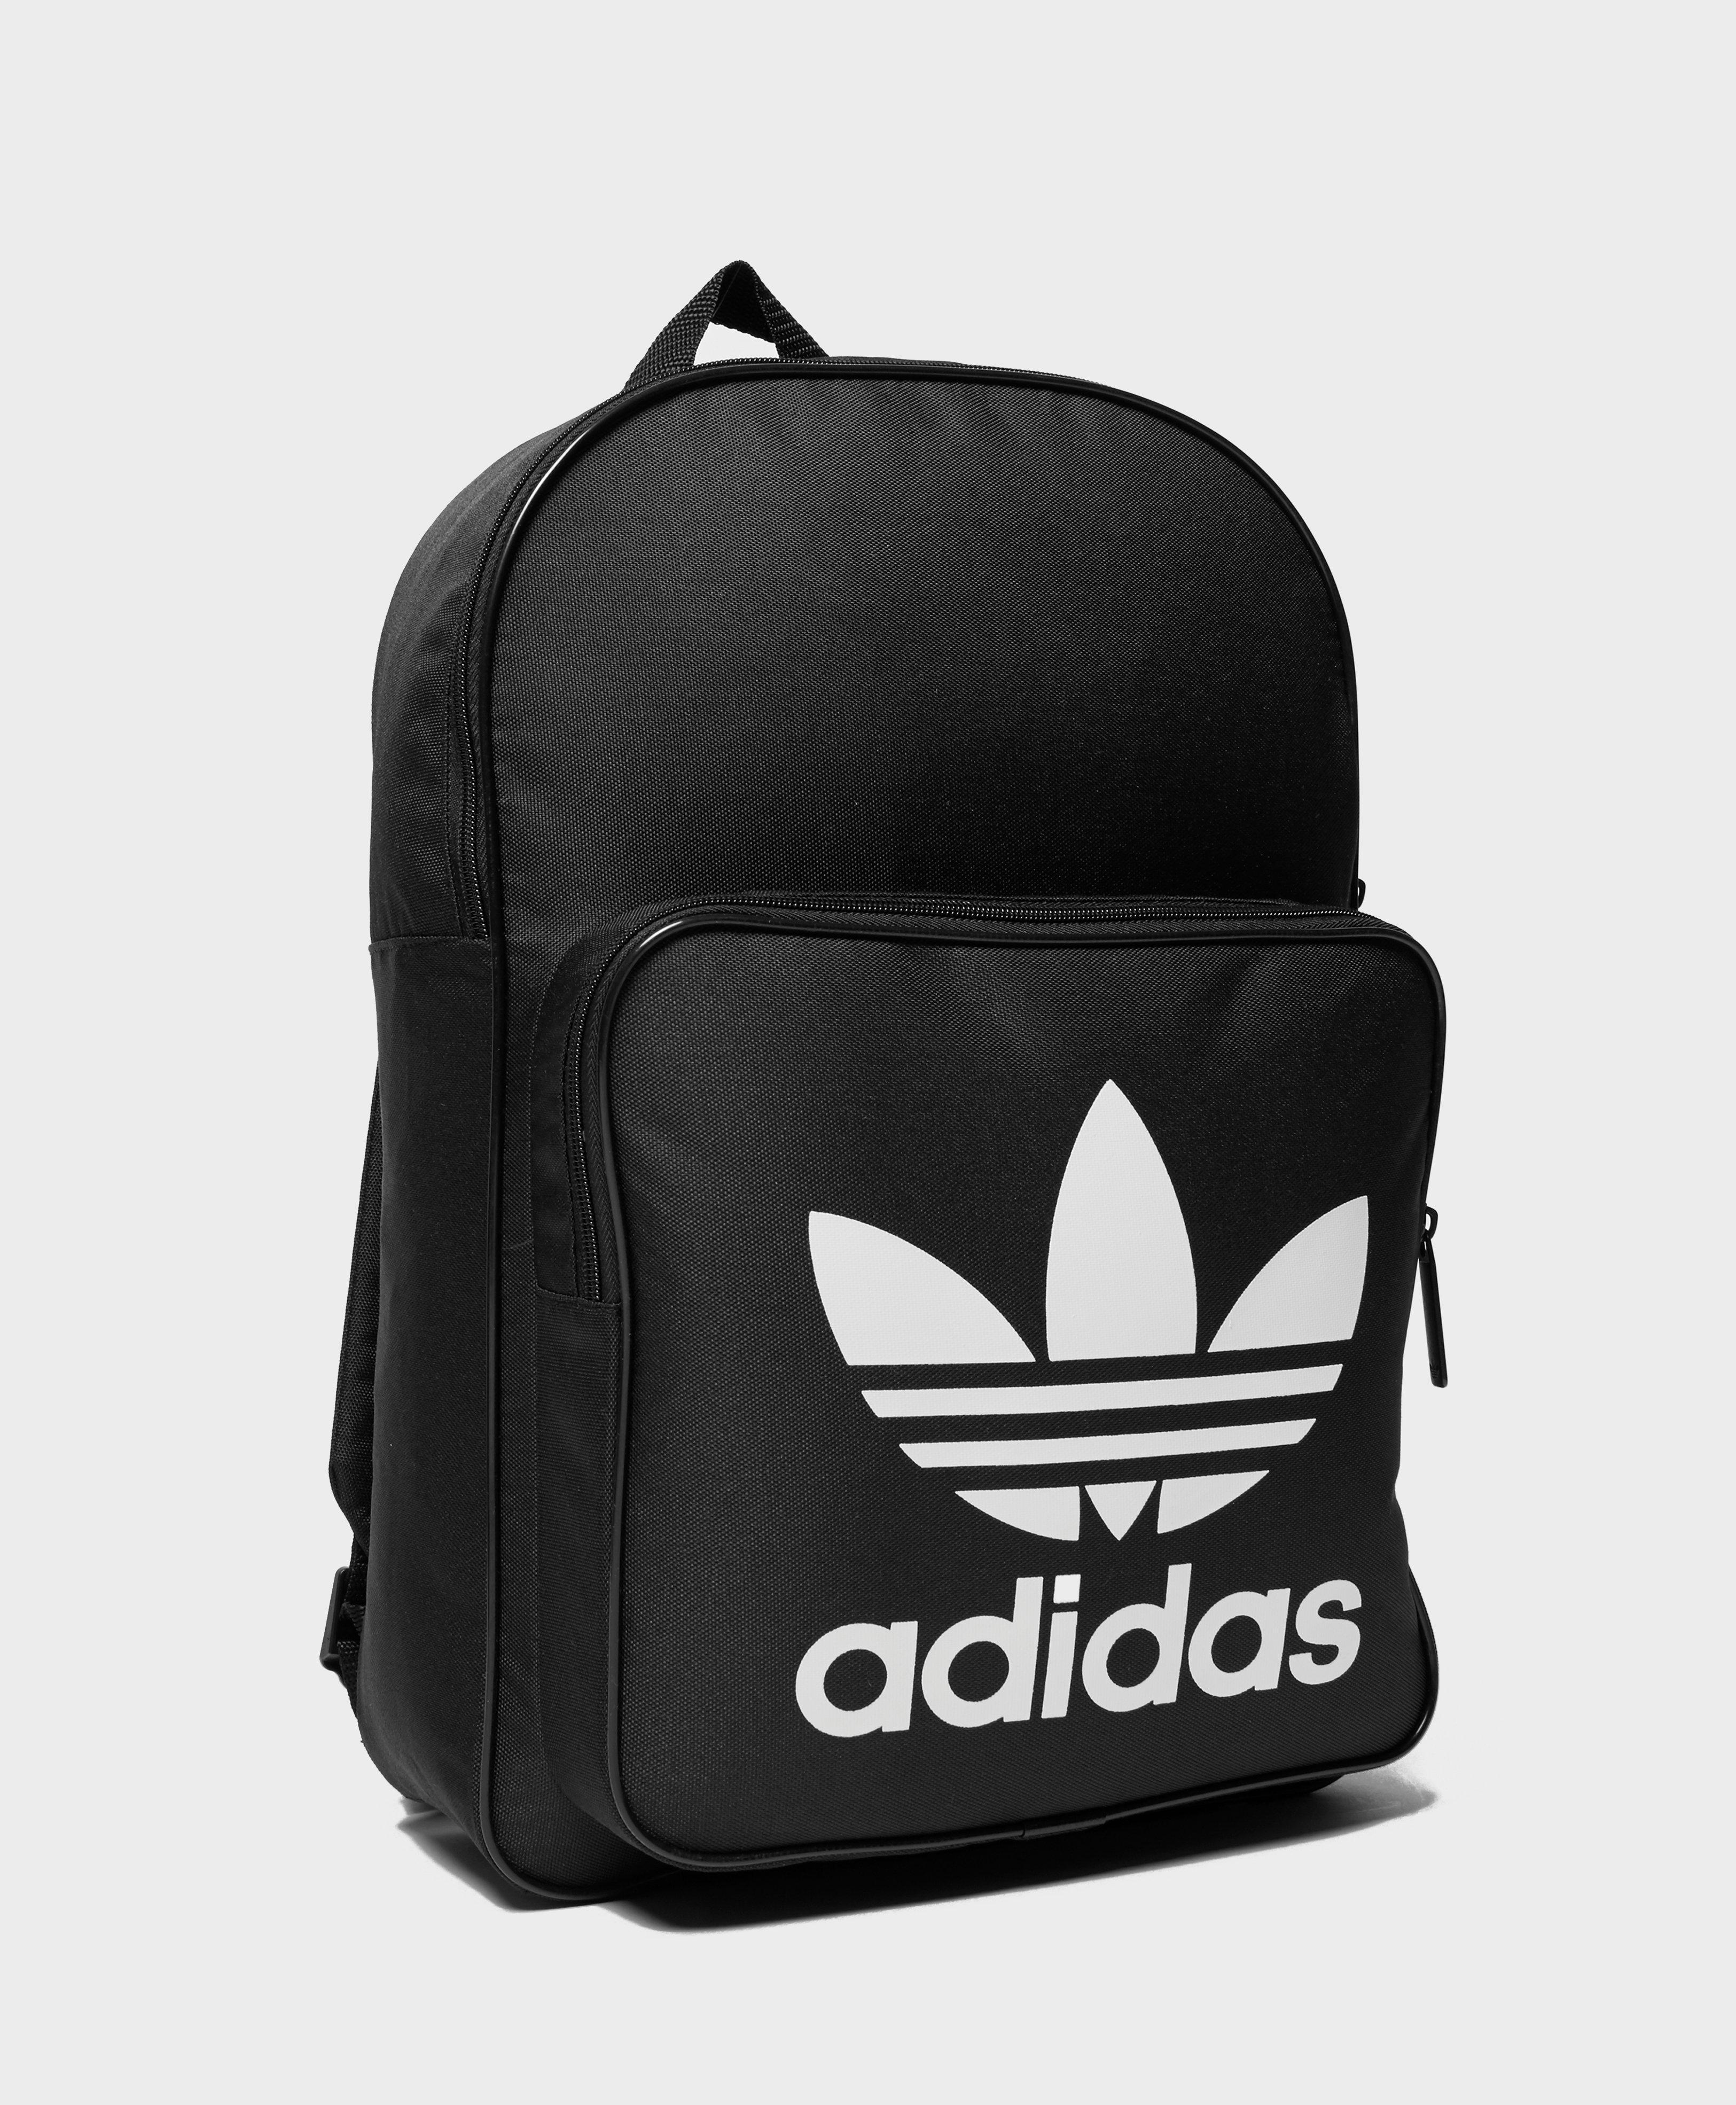 Lyst - adidas Originals Classic Trefoil Backpack in Black for Men - Save 35% ed11c61748